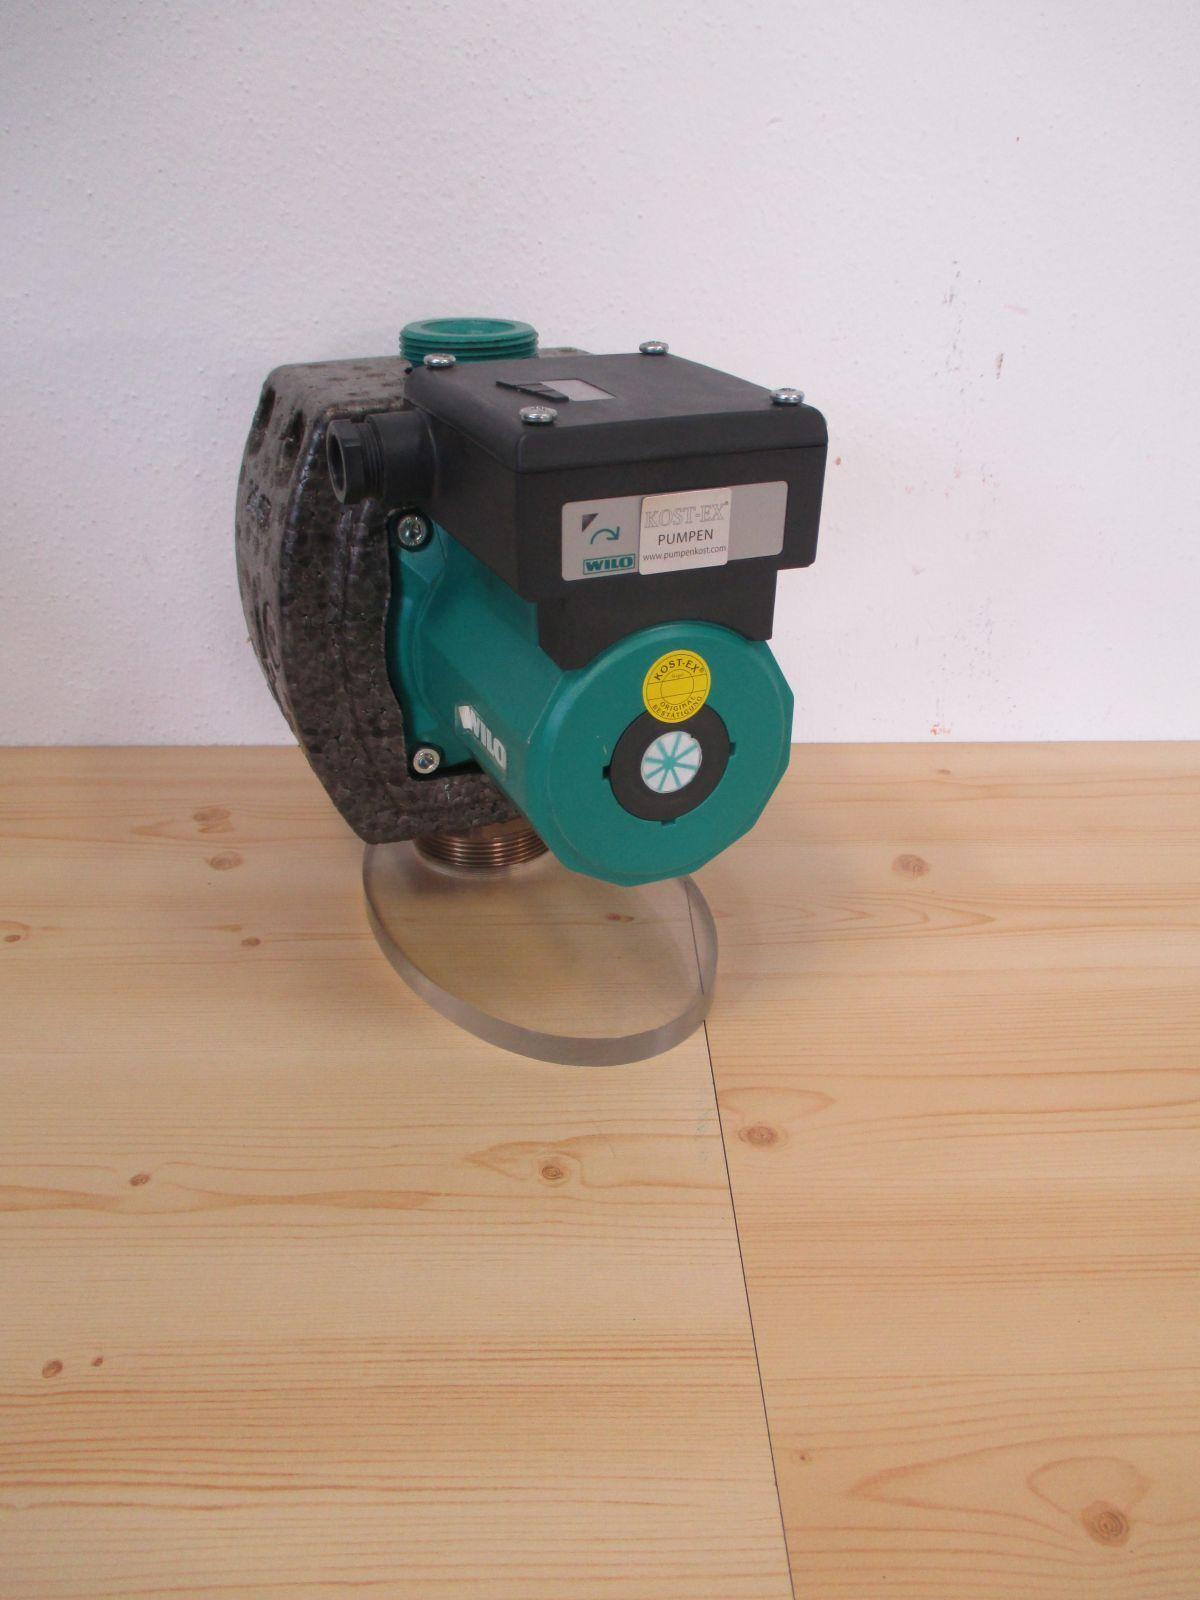 Pumpe Wilo Top RS 25   7 Heizungspumpe 3 x 400  V Umwälzpumpe KOST-EX P18 29